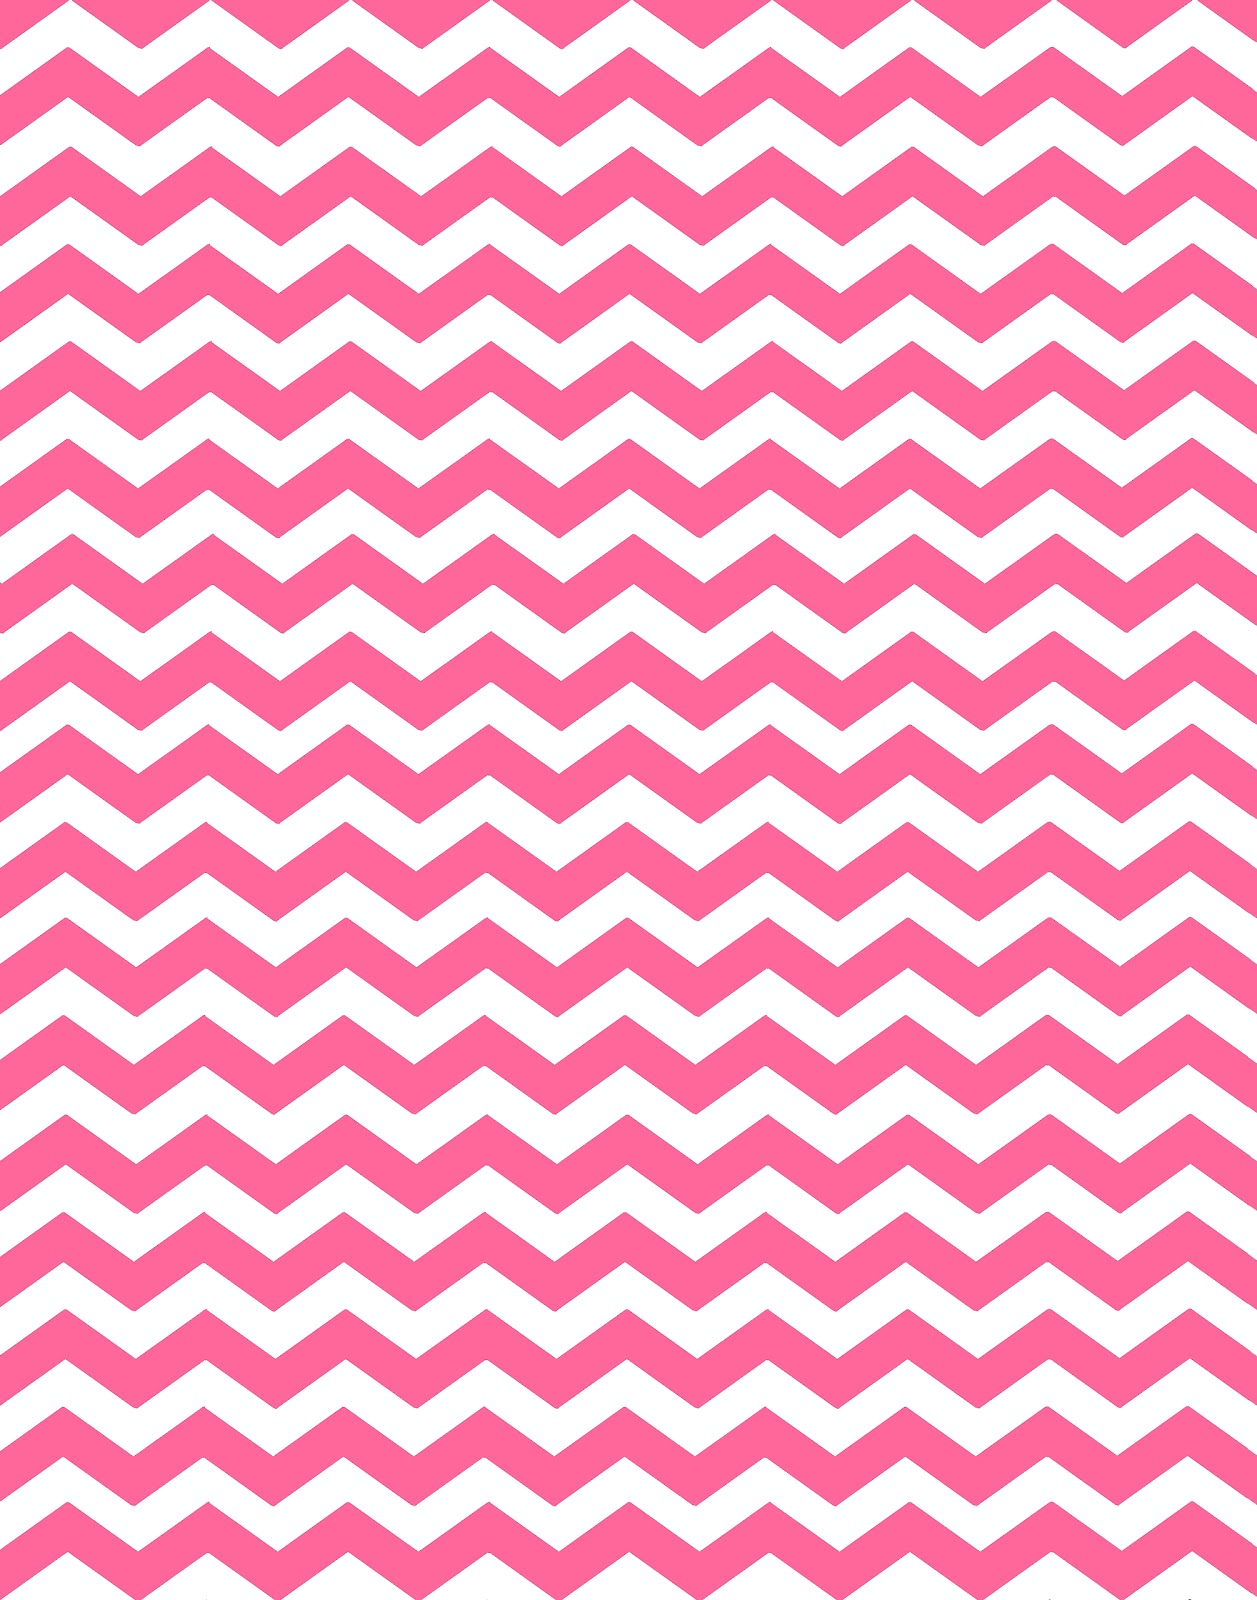 light pink chevron wallpaper - photo #21